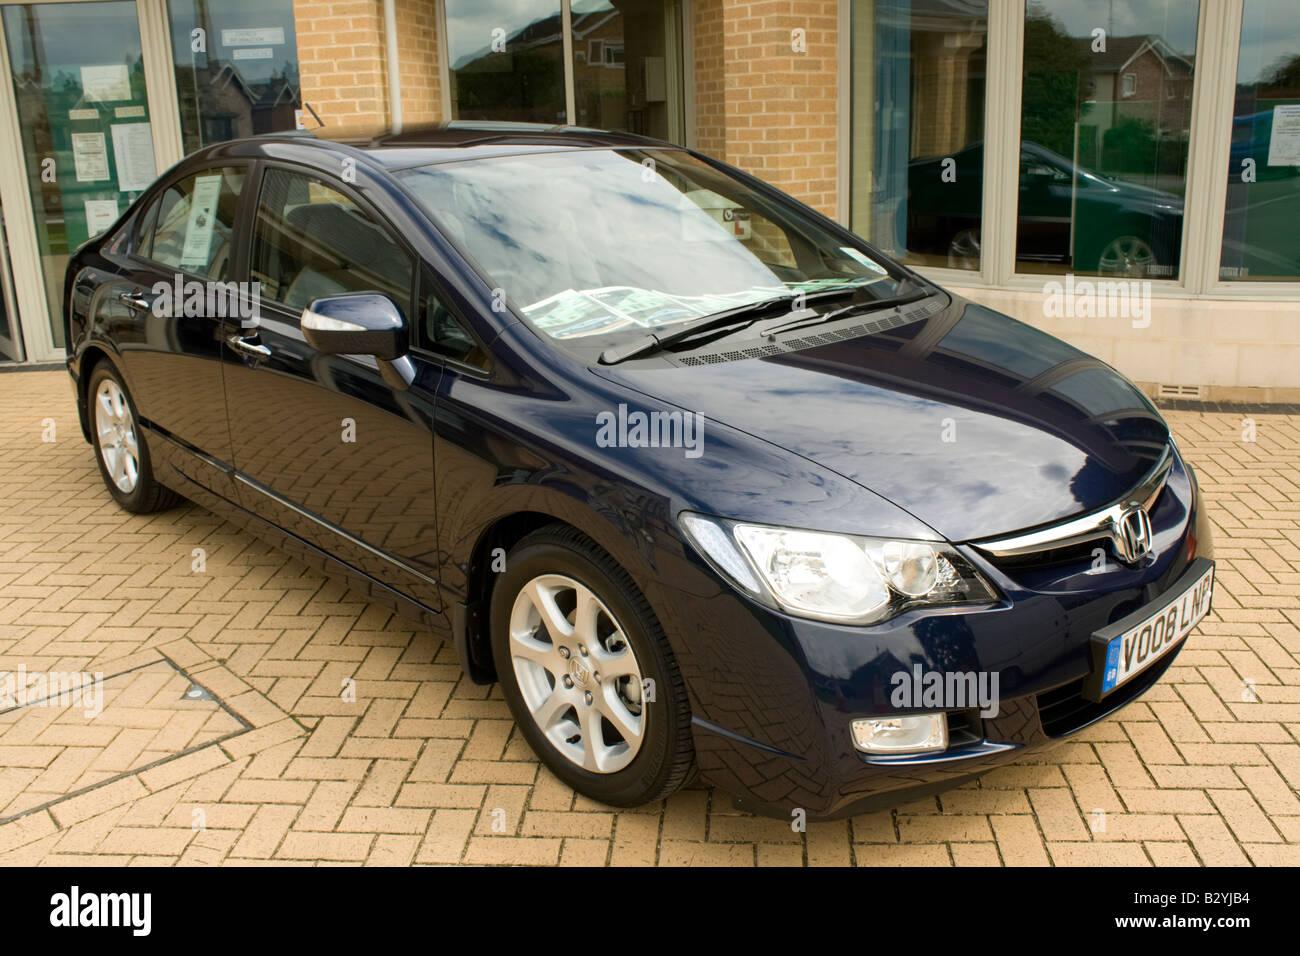 Honda Civic 1 4 IMA ES Hybrid Dual Fuel Petrol Electric Car UK